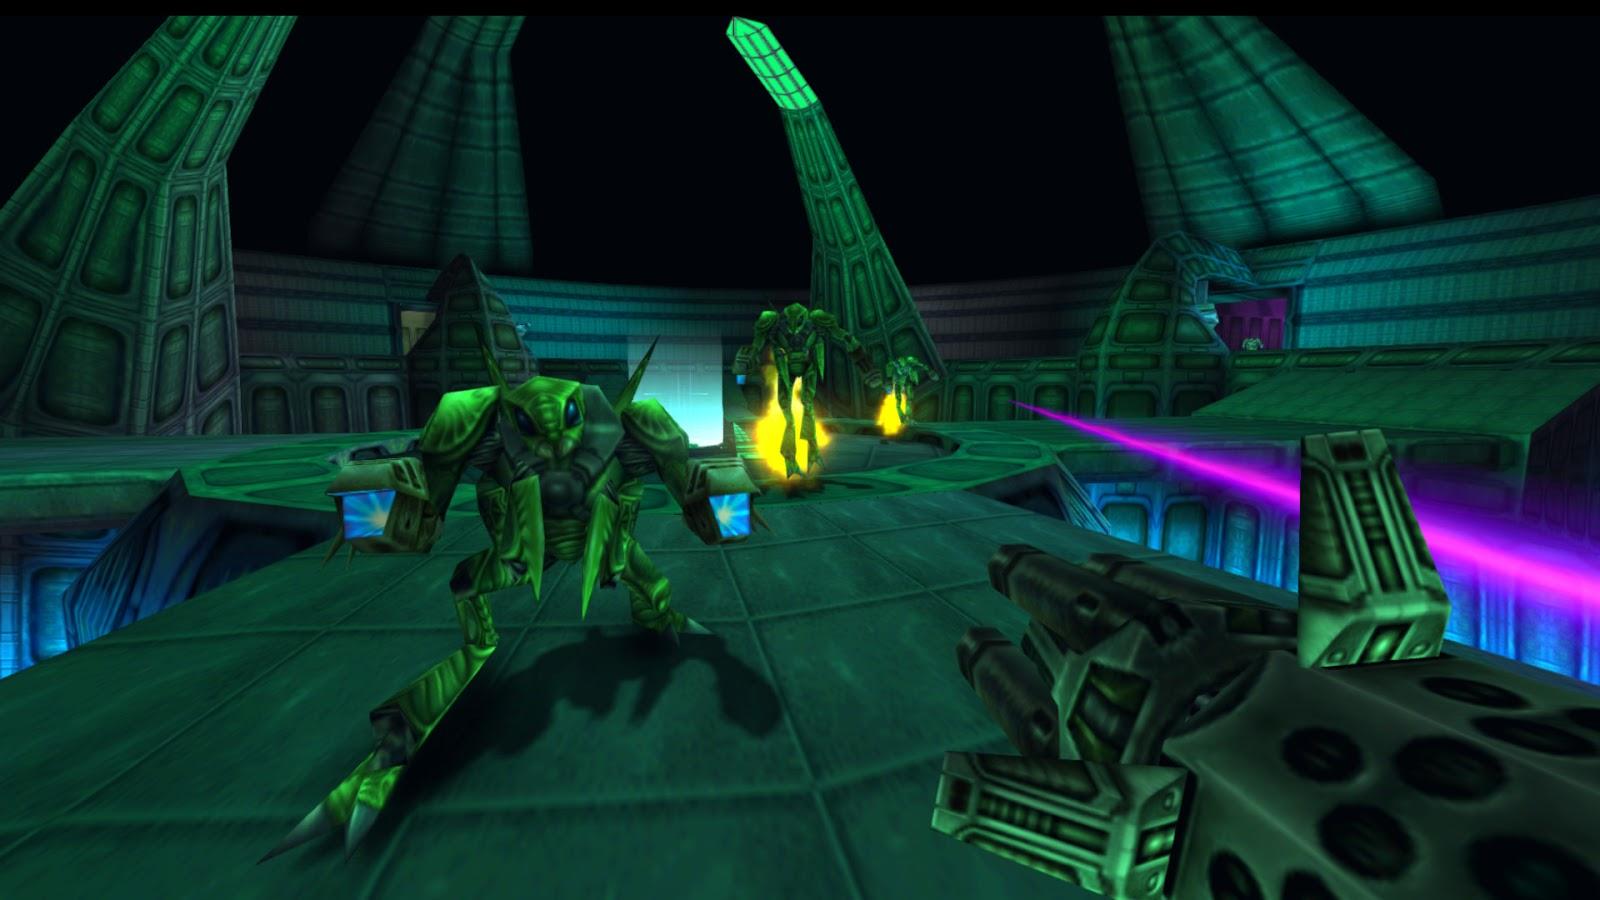 Turok 2 Seeds Of Evil Remastered ESPAÑOL PC Descargar Full (PLAZA) 2